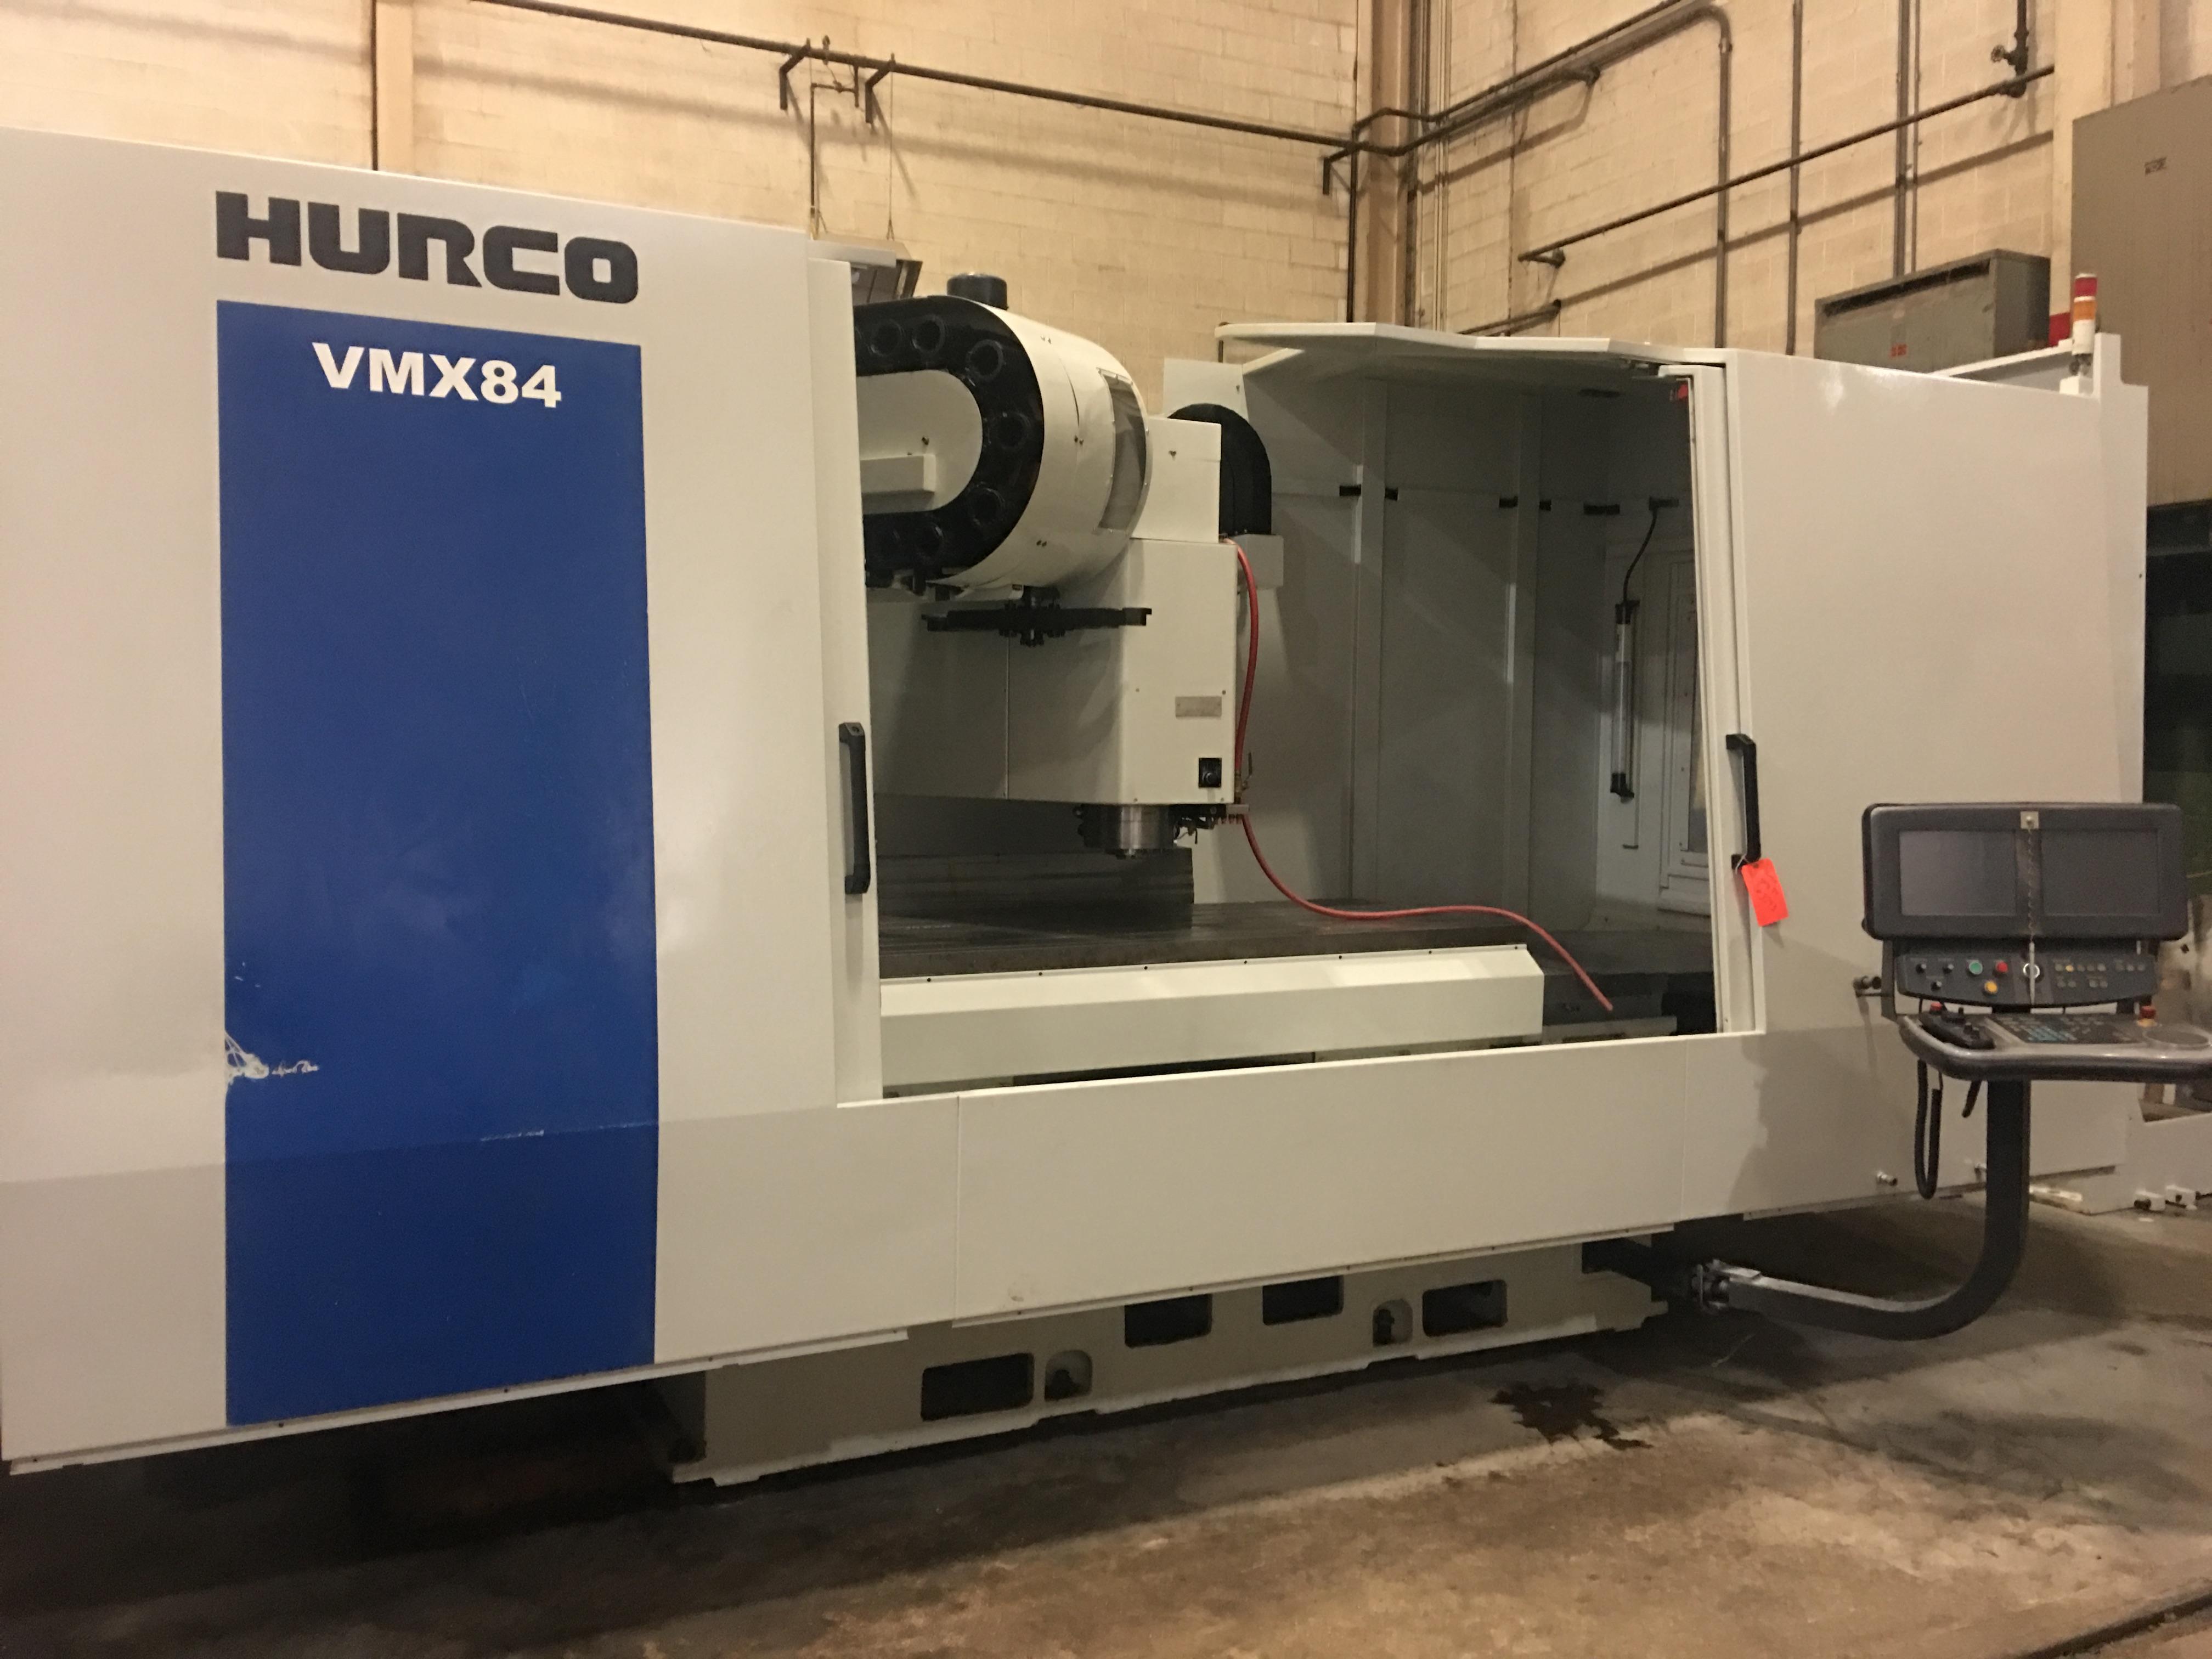 Hurco VMX84 CNC Vertical Machining Center, WinMax, 84